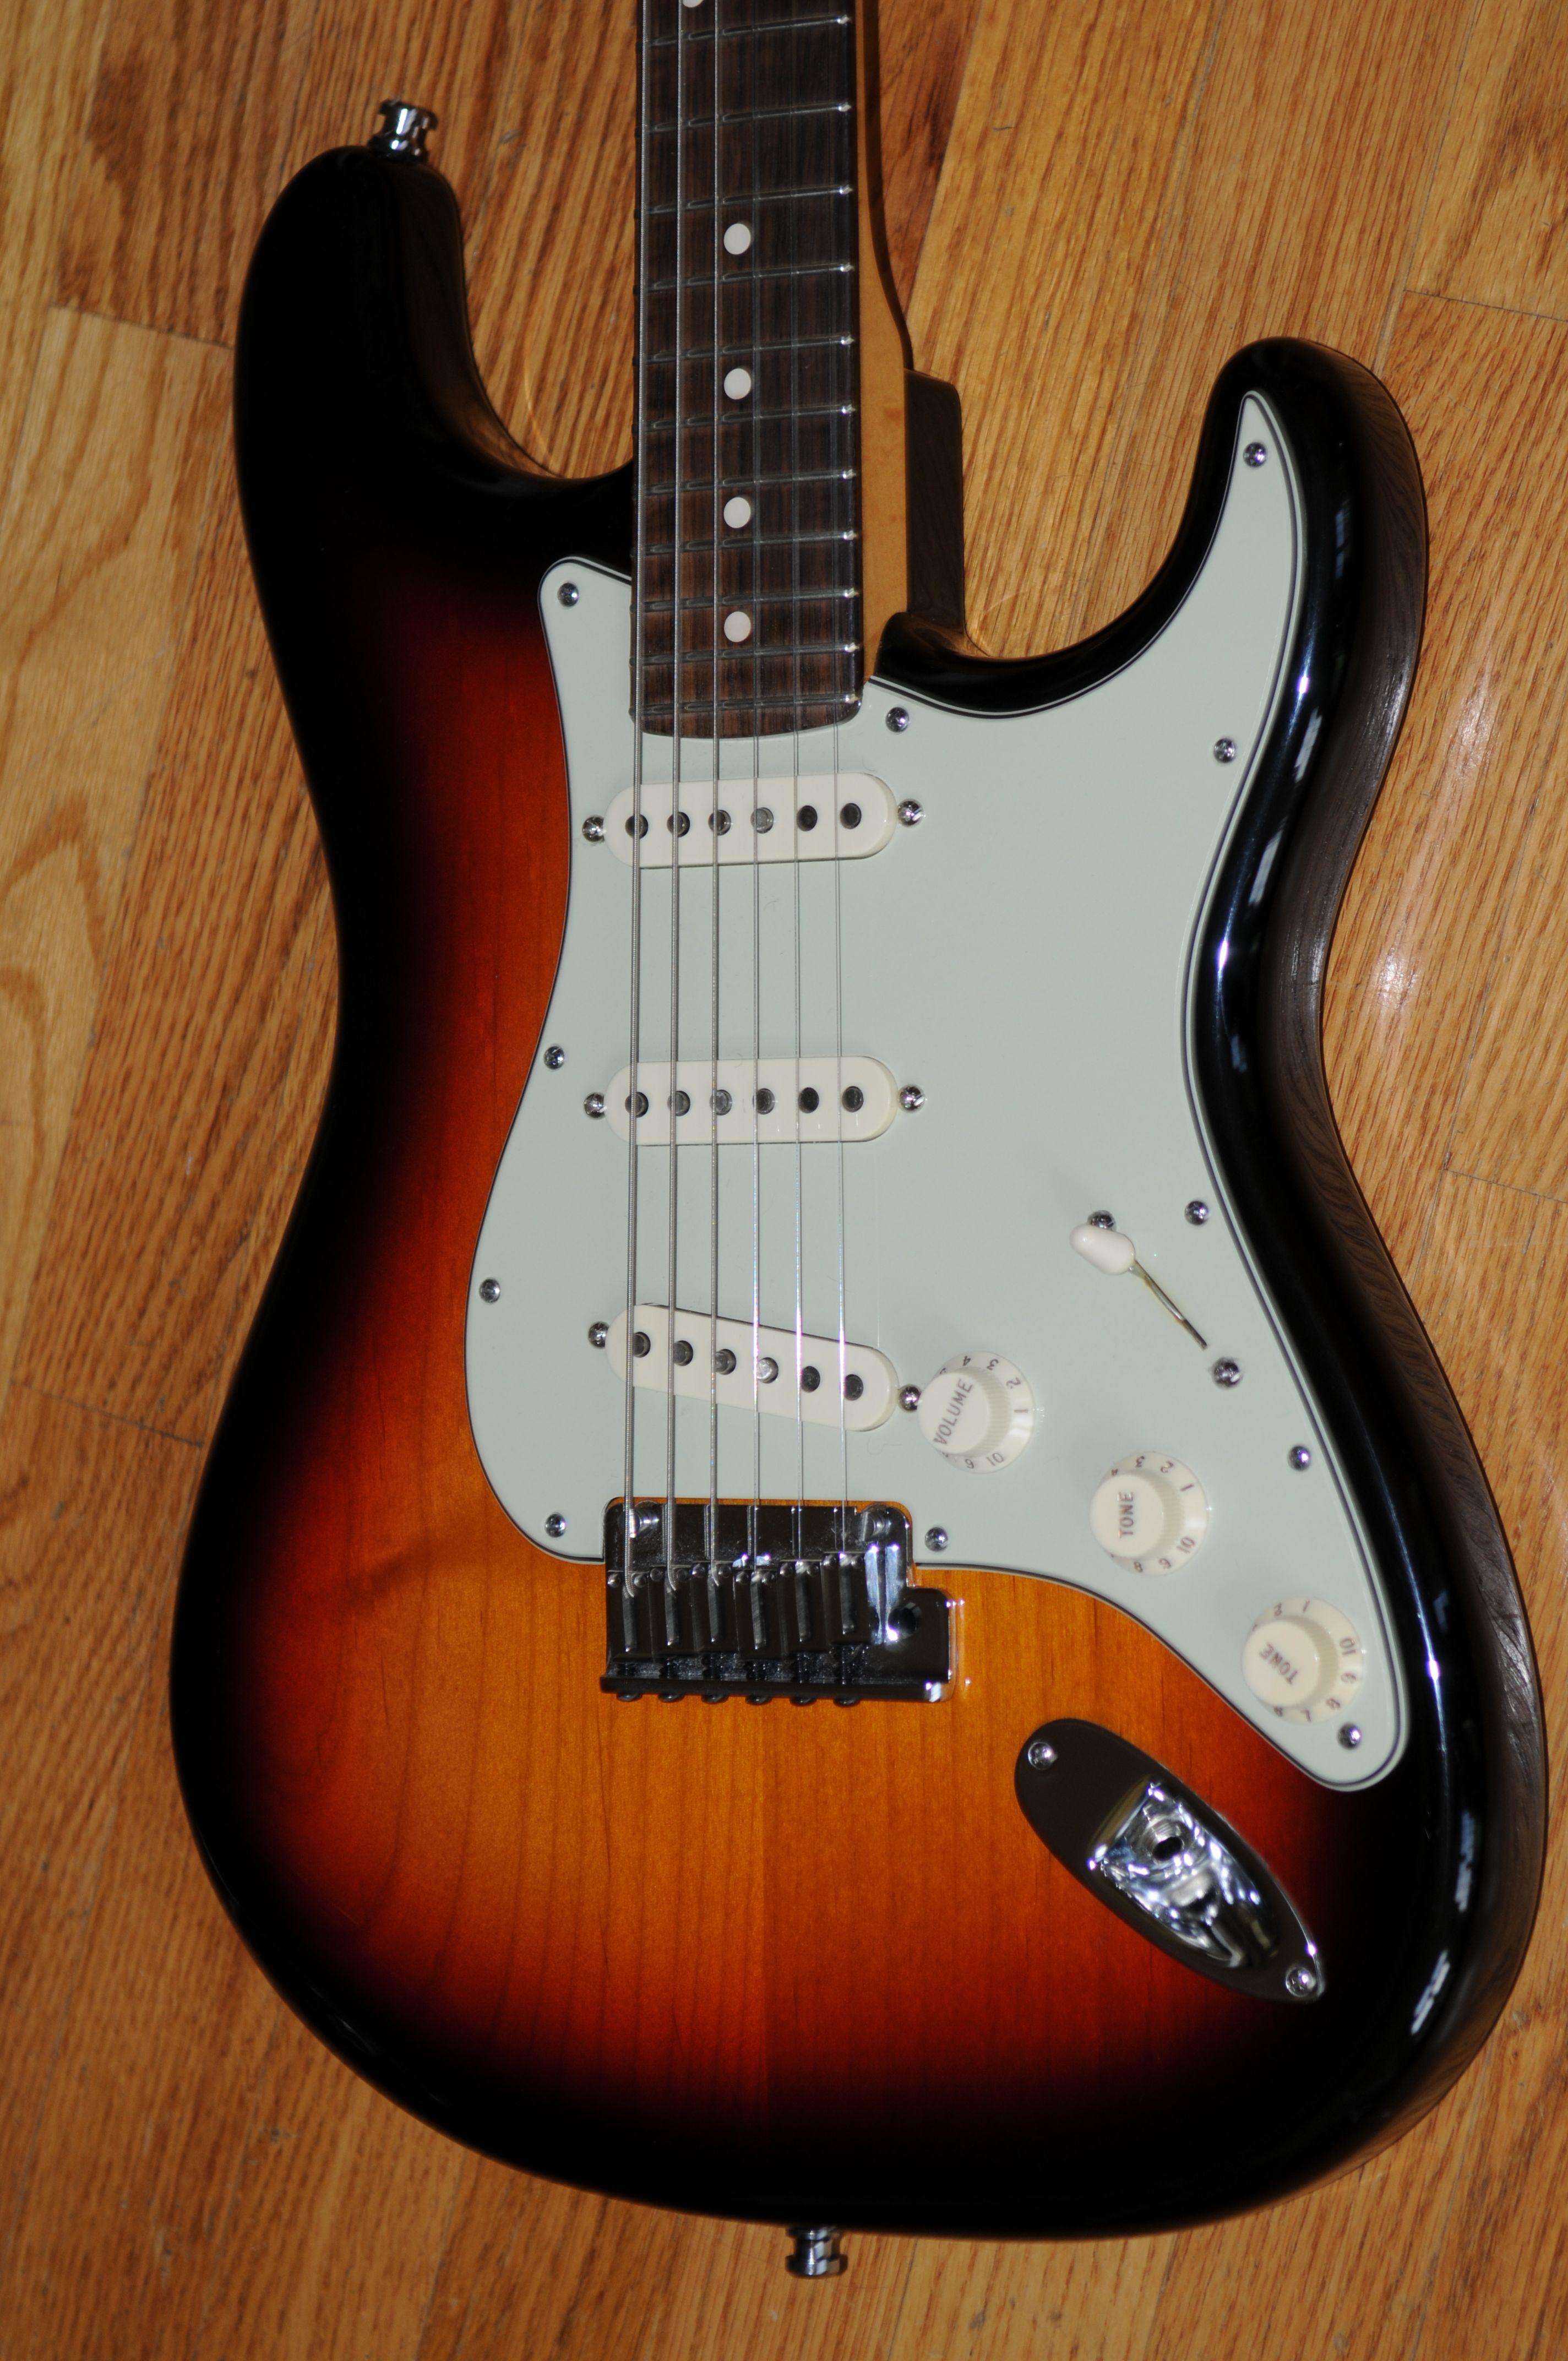 2009 Fender Custom Shop 'Custom Deluxe Strat' – Excellent Nonsmoking Condition